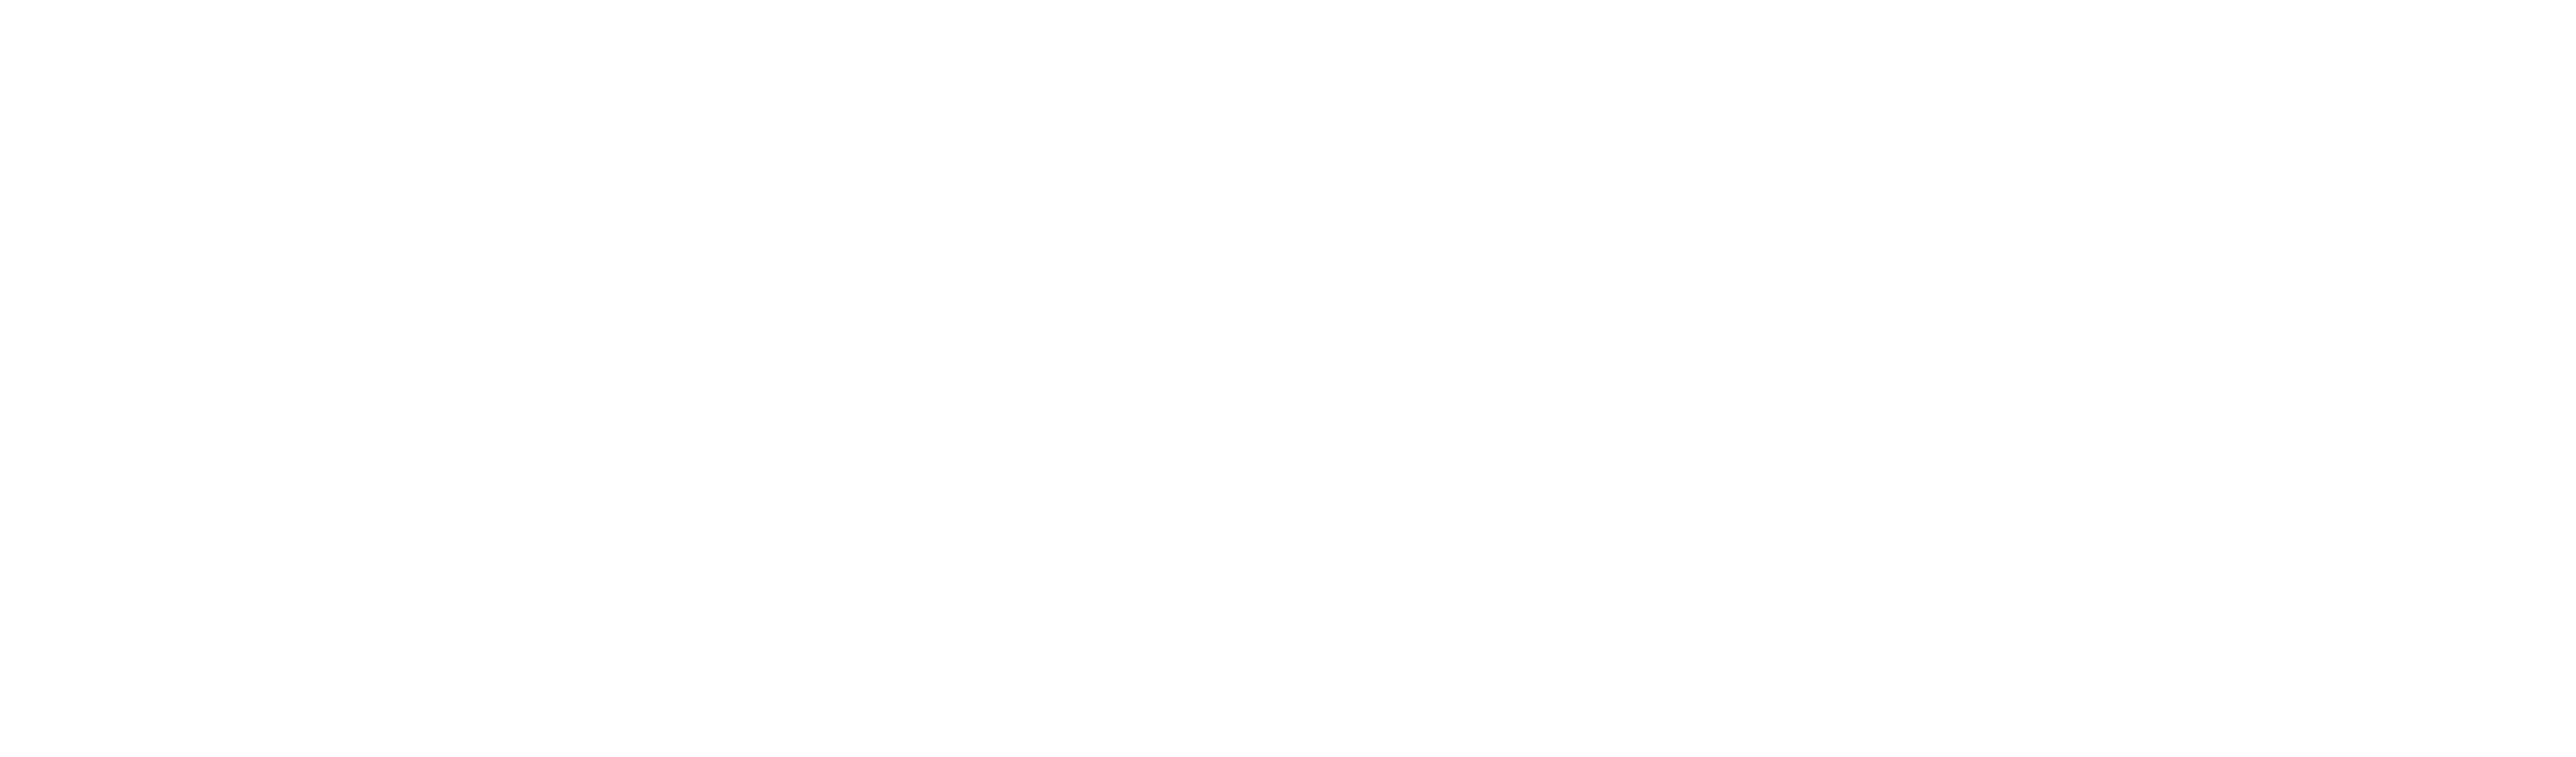 Graymeta - White